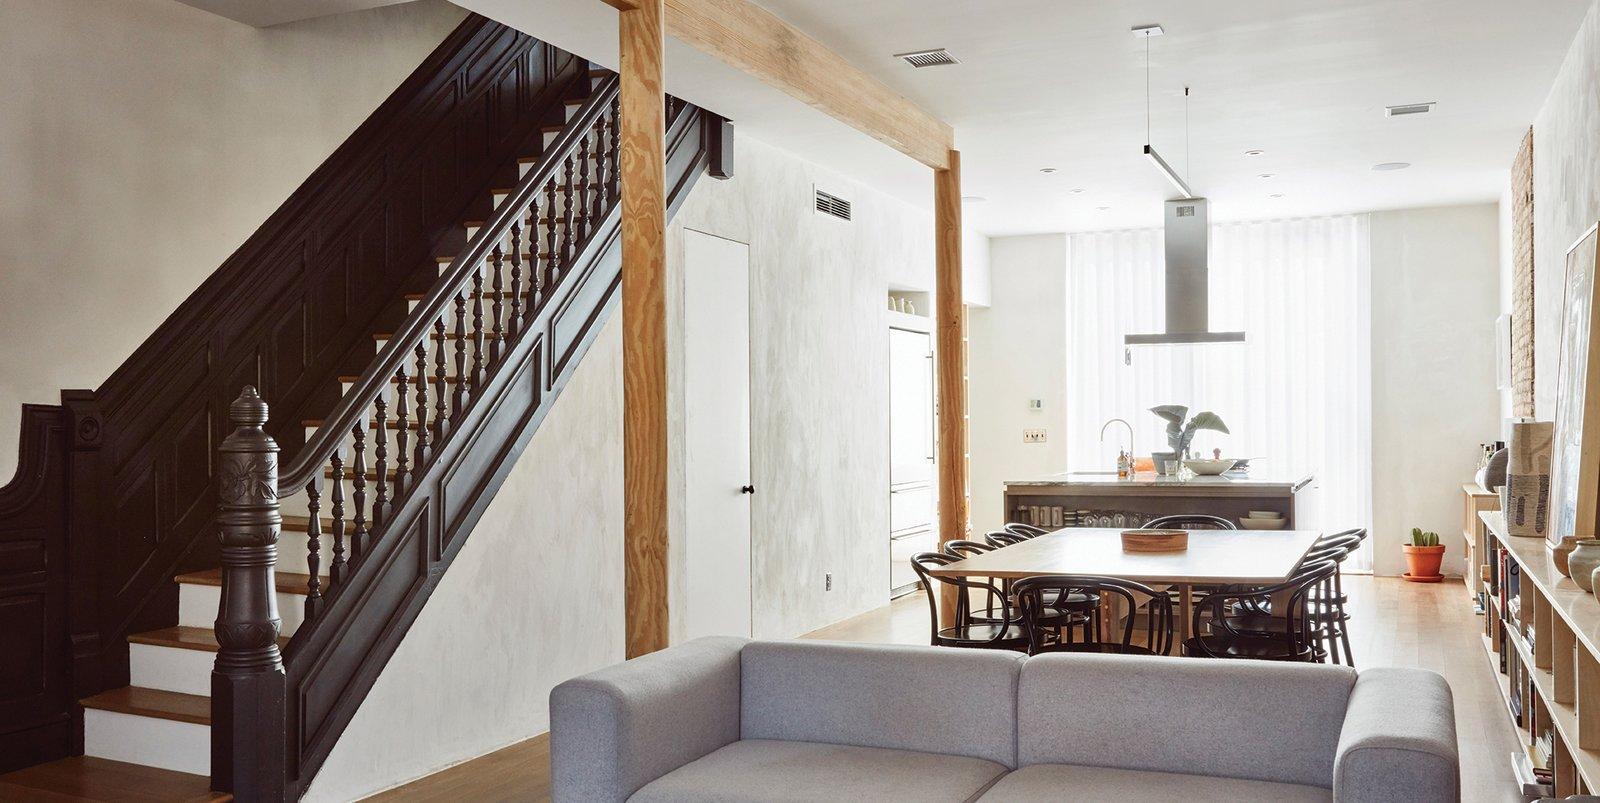 Bedford Stuyvesant Brownstone Bedford Stuyvesant Brownstone Modern Home in